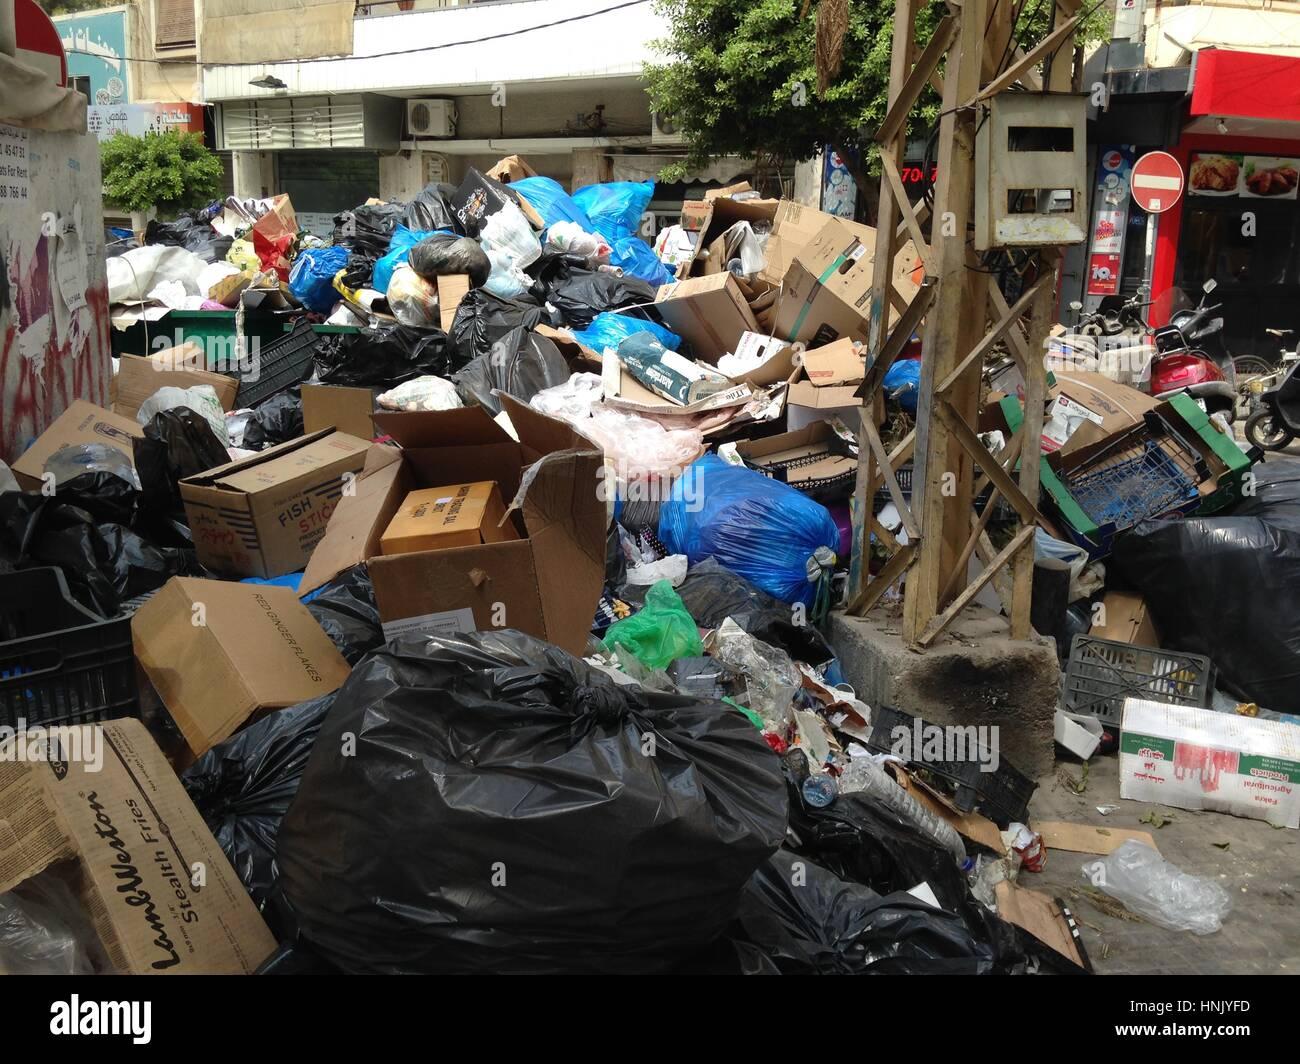 Basura amontonadas en calles Makadisi en Hamra, Beirut, Líbano Imagen De Stock